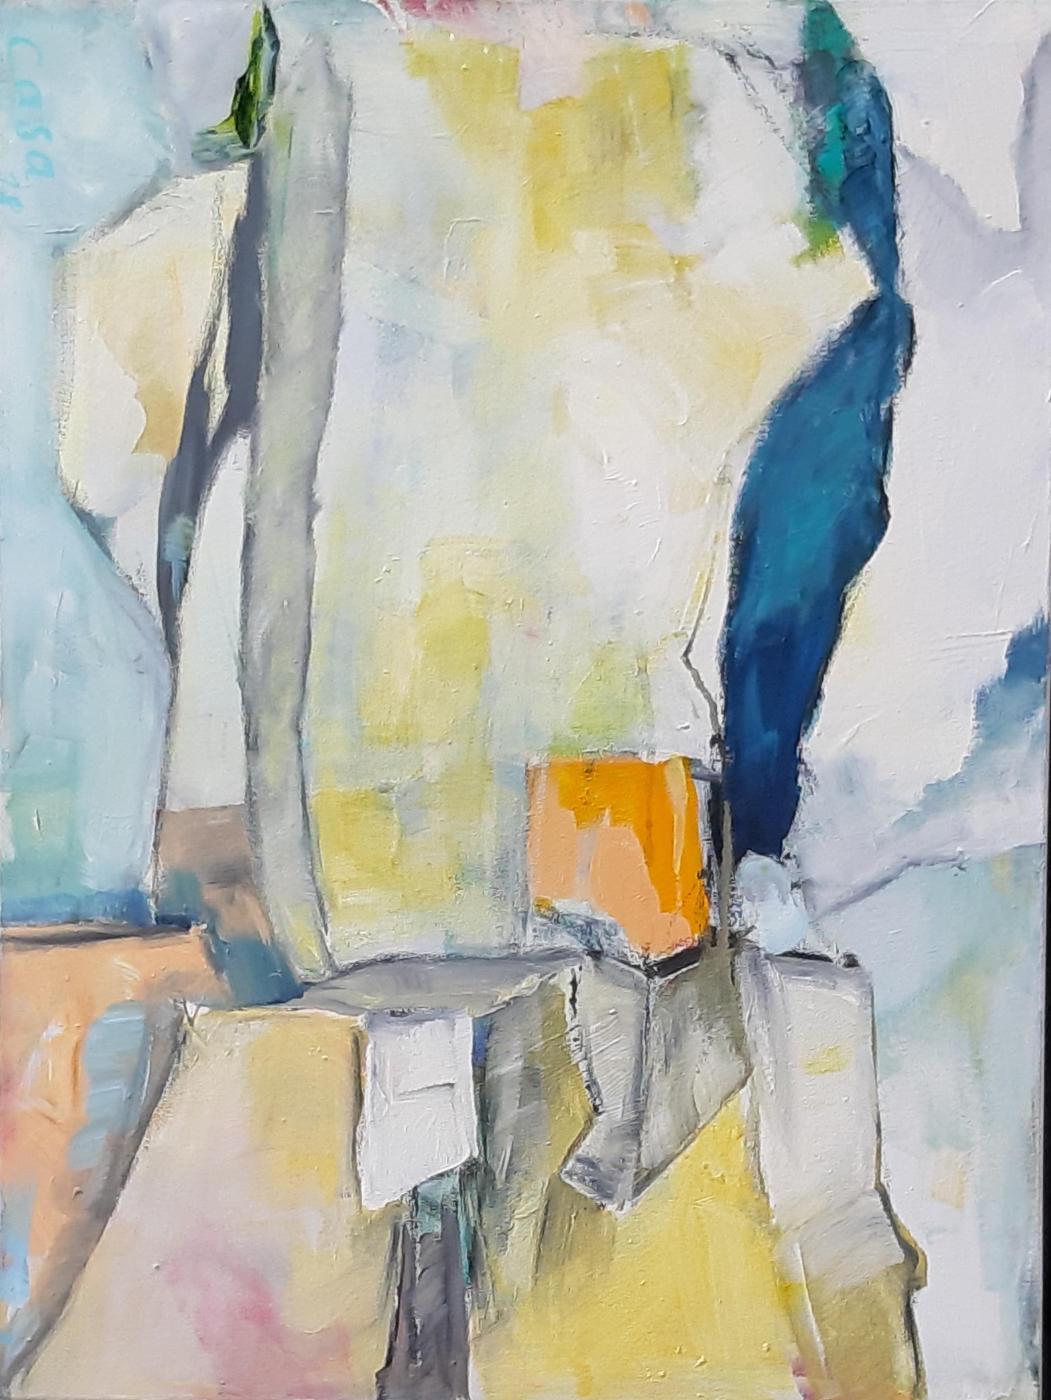 Alb III - Acryl auf Leinwand, 70 x 50 cm